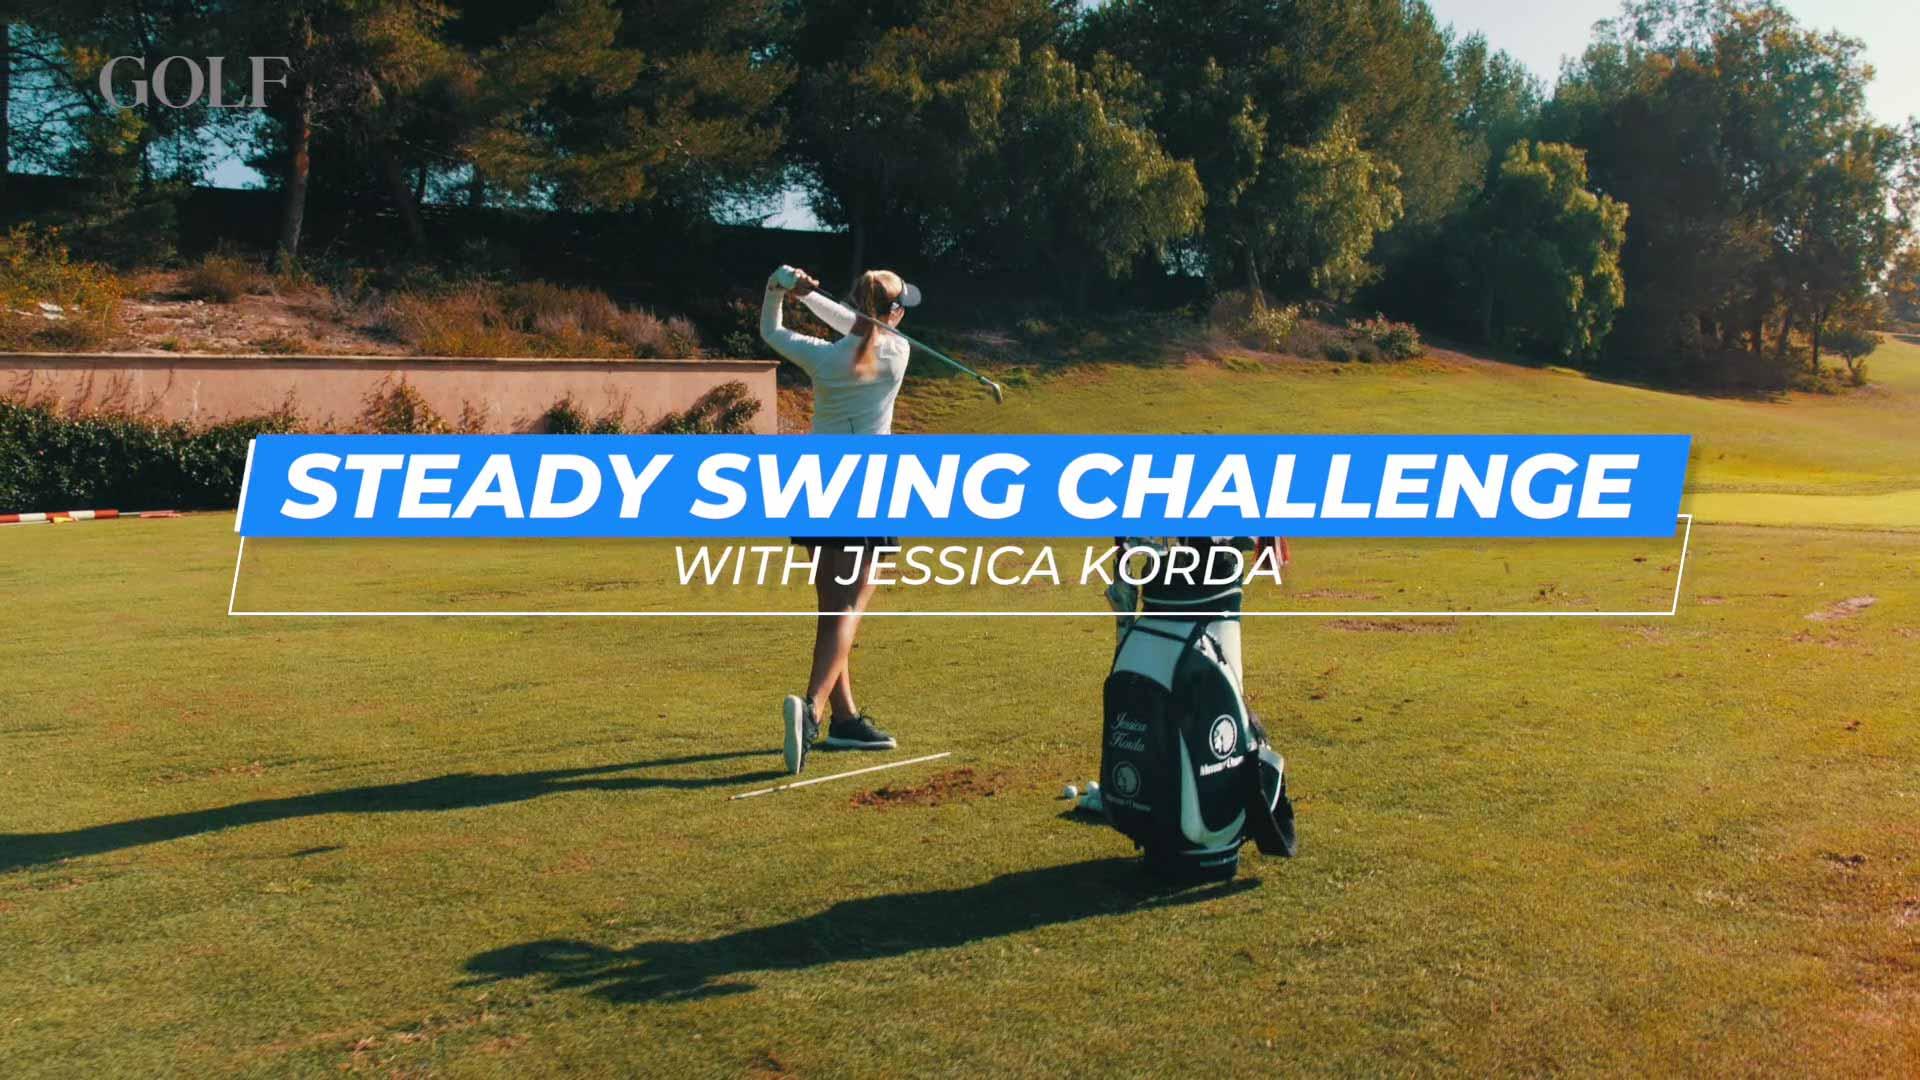 Steady Swing Challenge with Jessica Korda